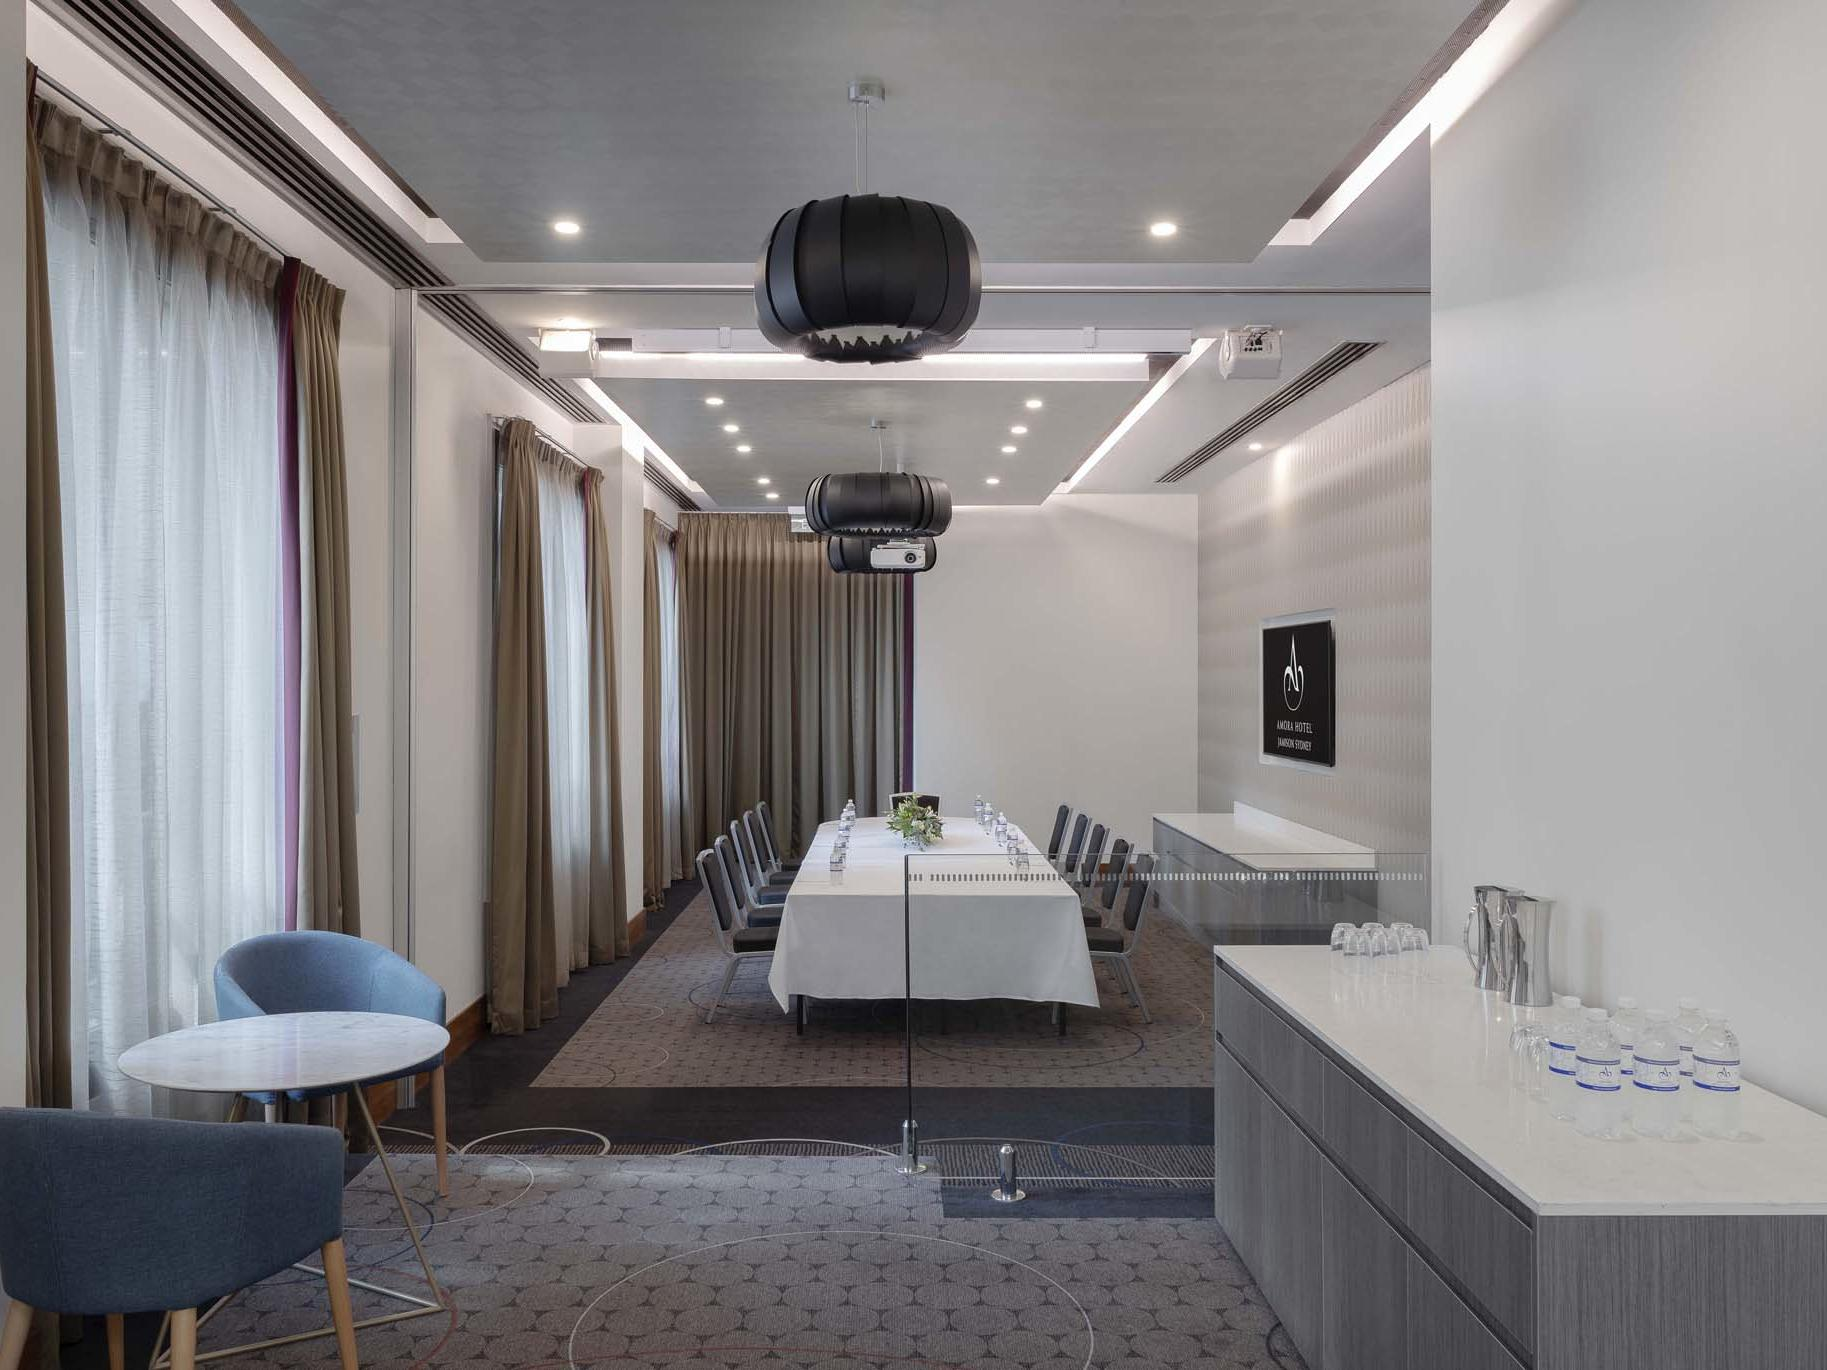 Preston Rooms - Amora Hotel